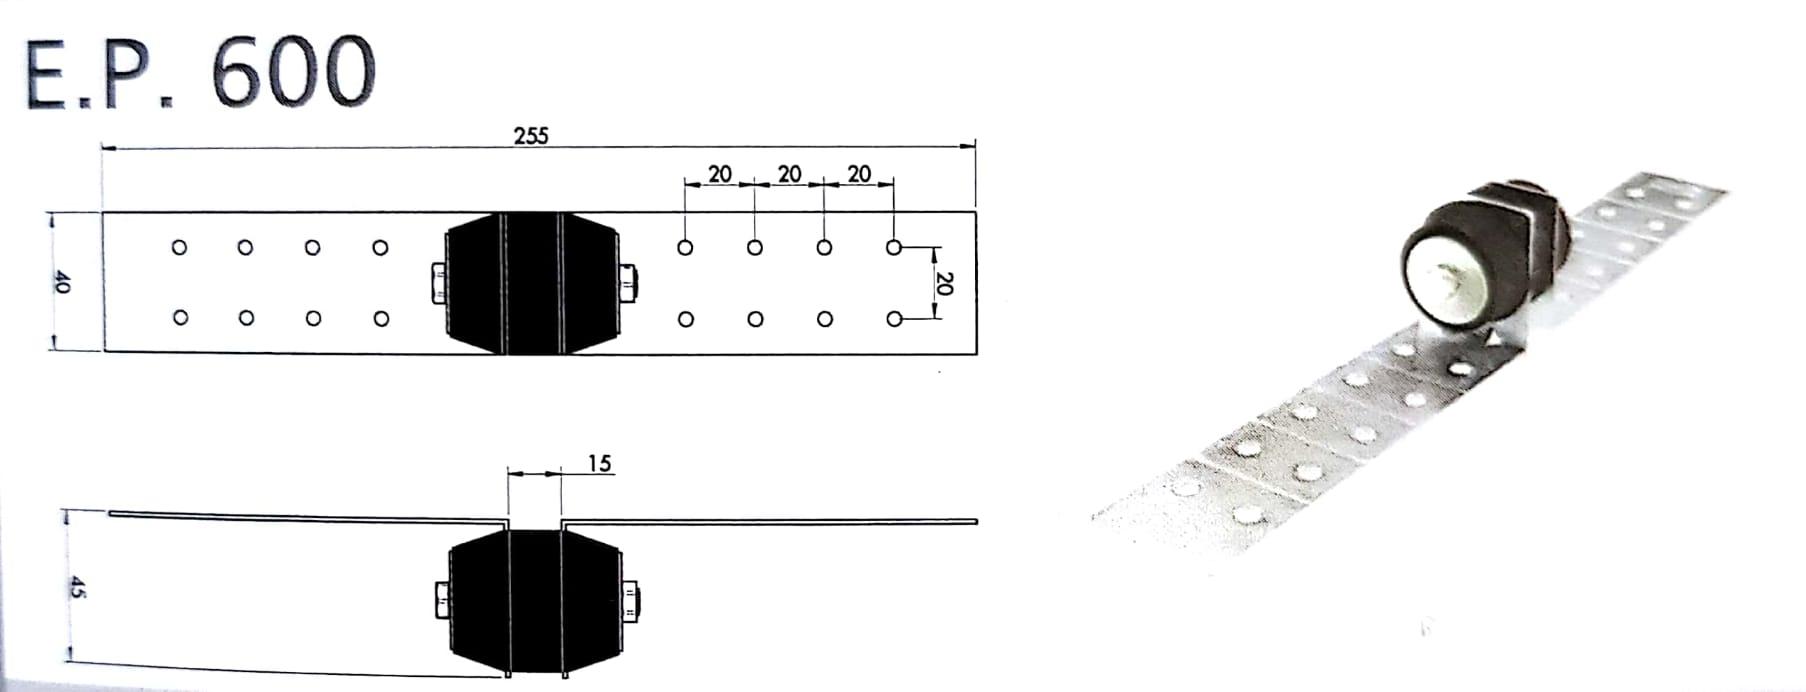 Custom EP600 wall vibration isolation mount